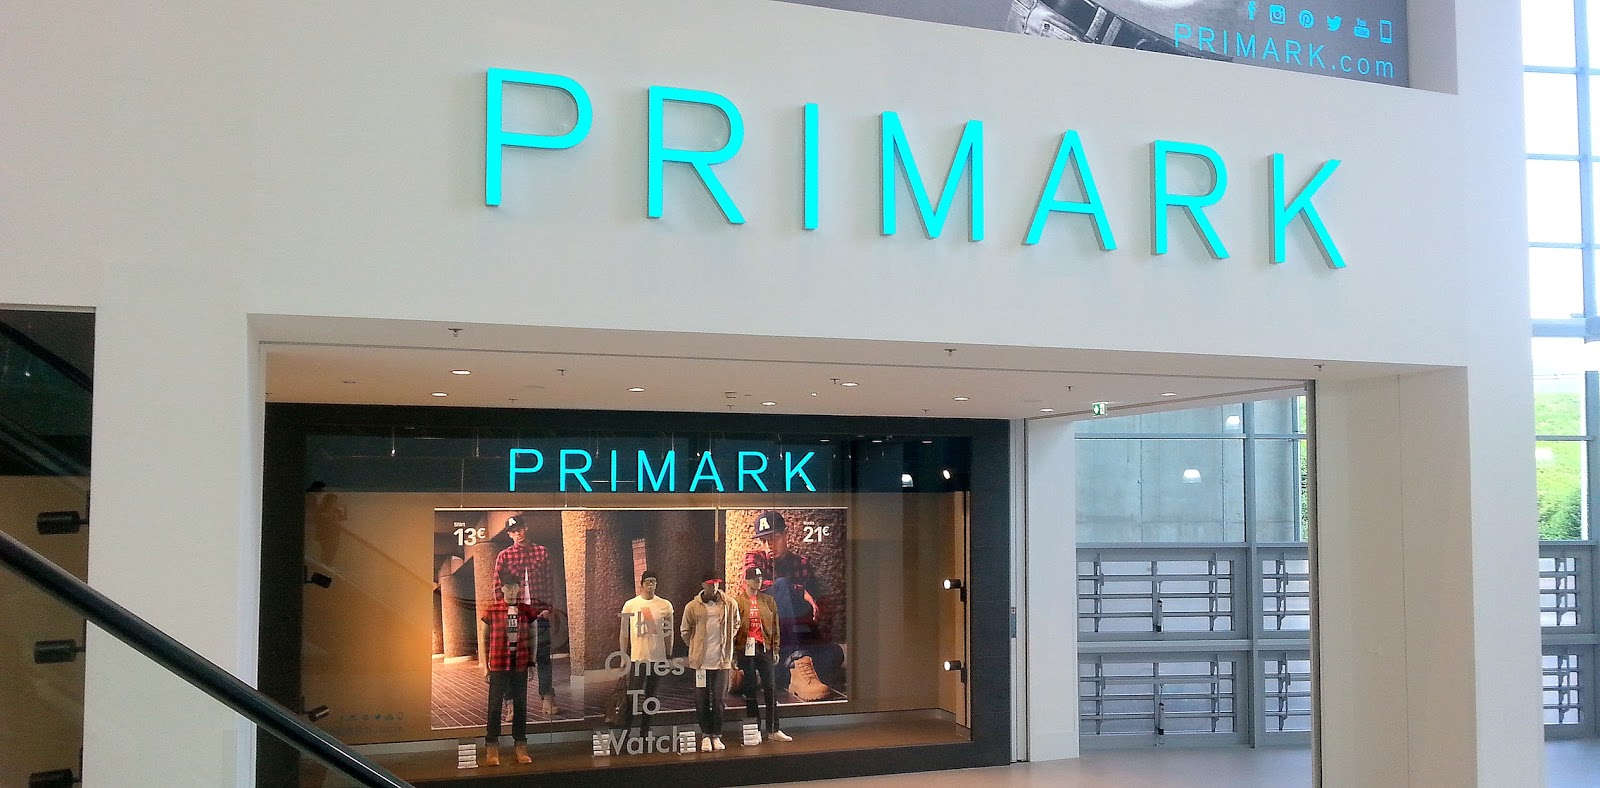 primark - photo #15